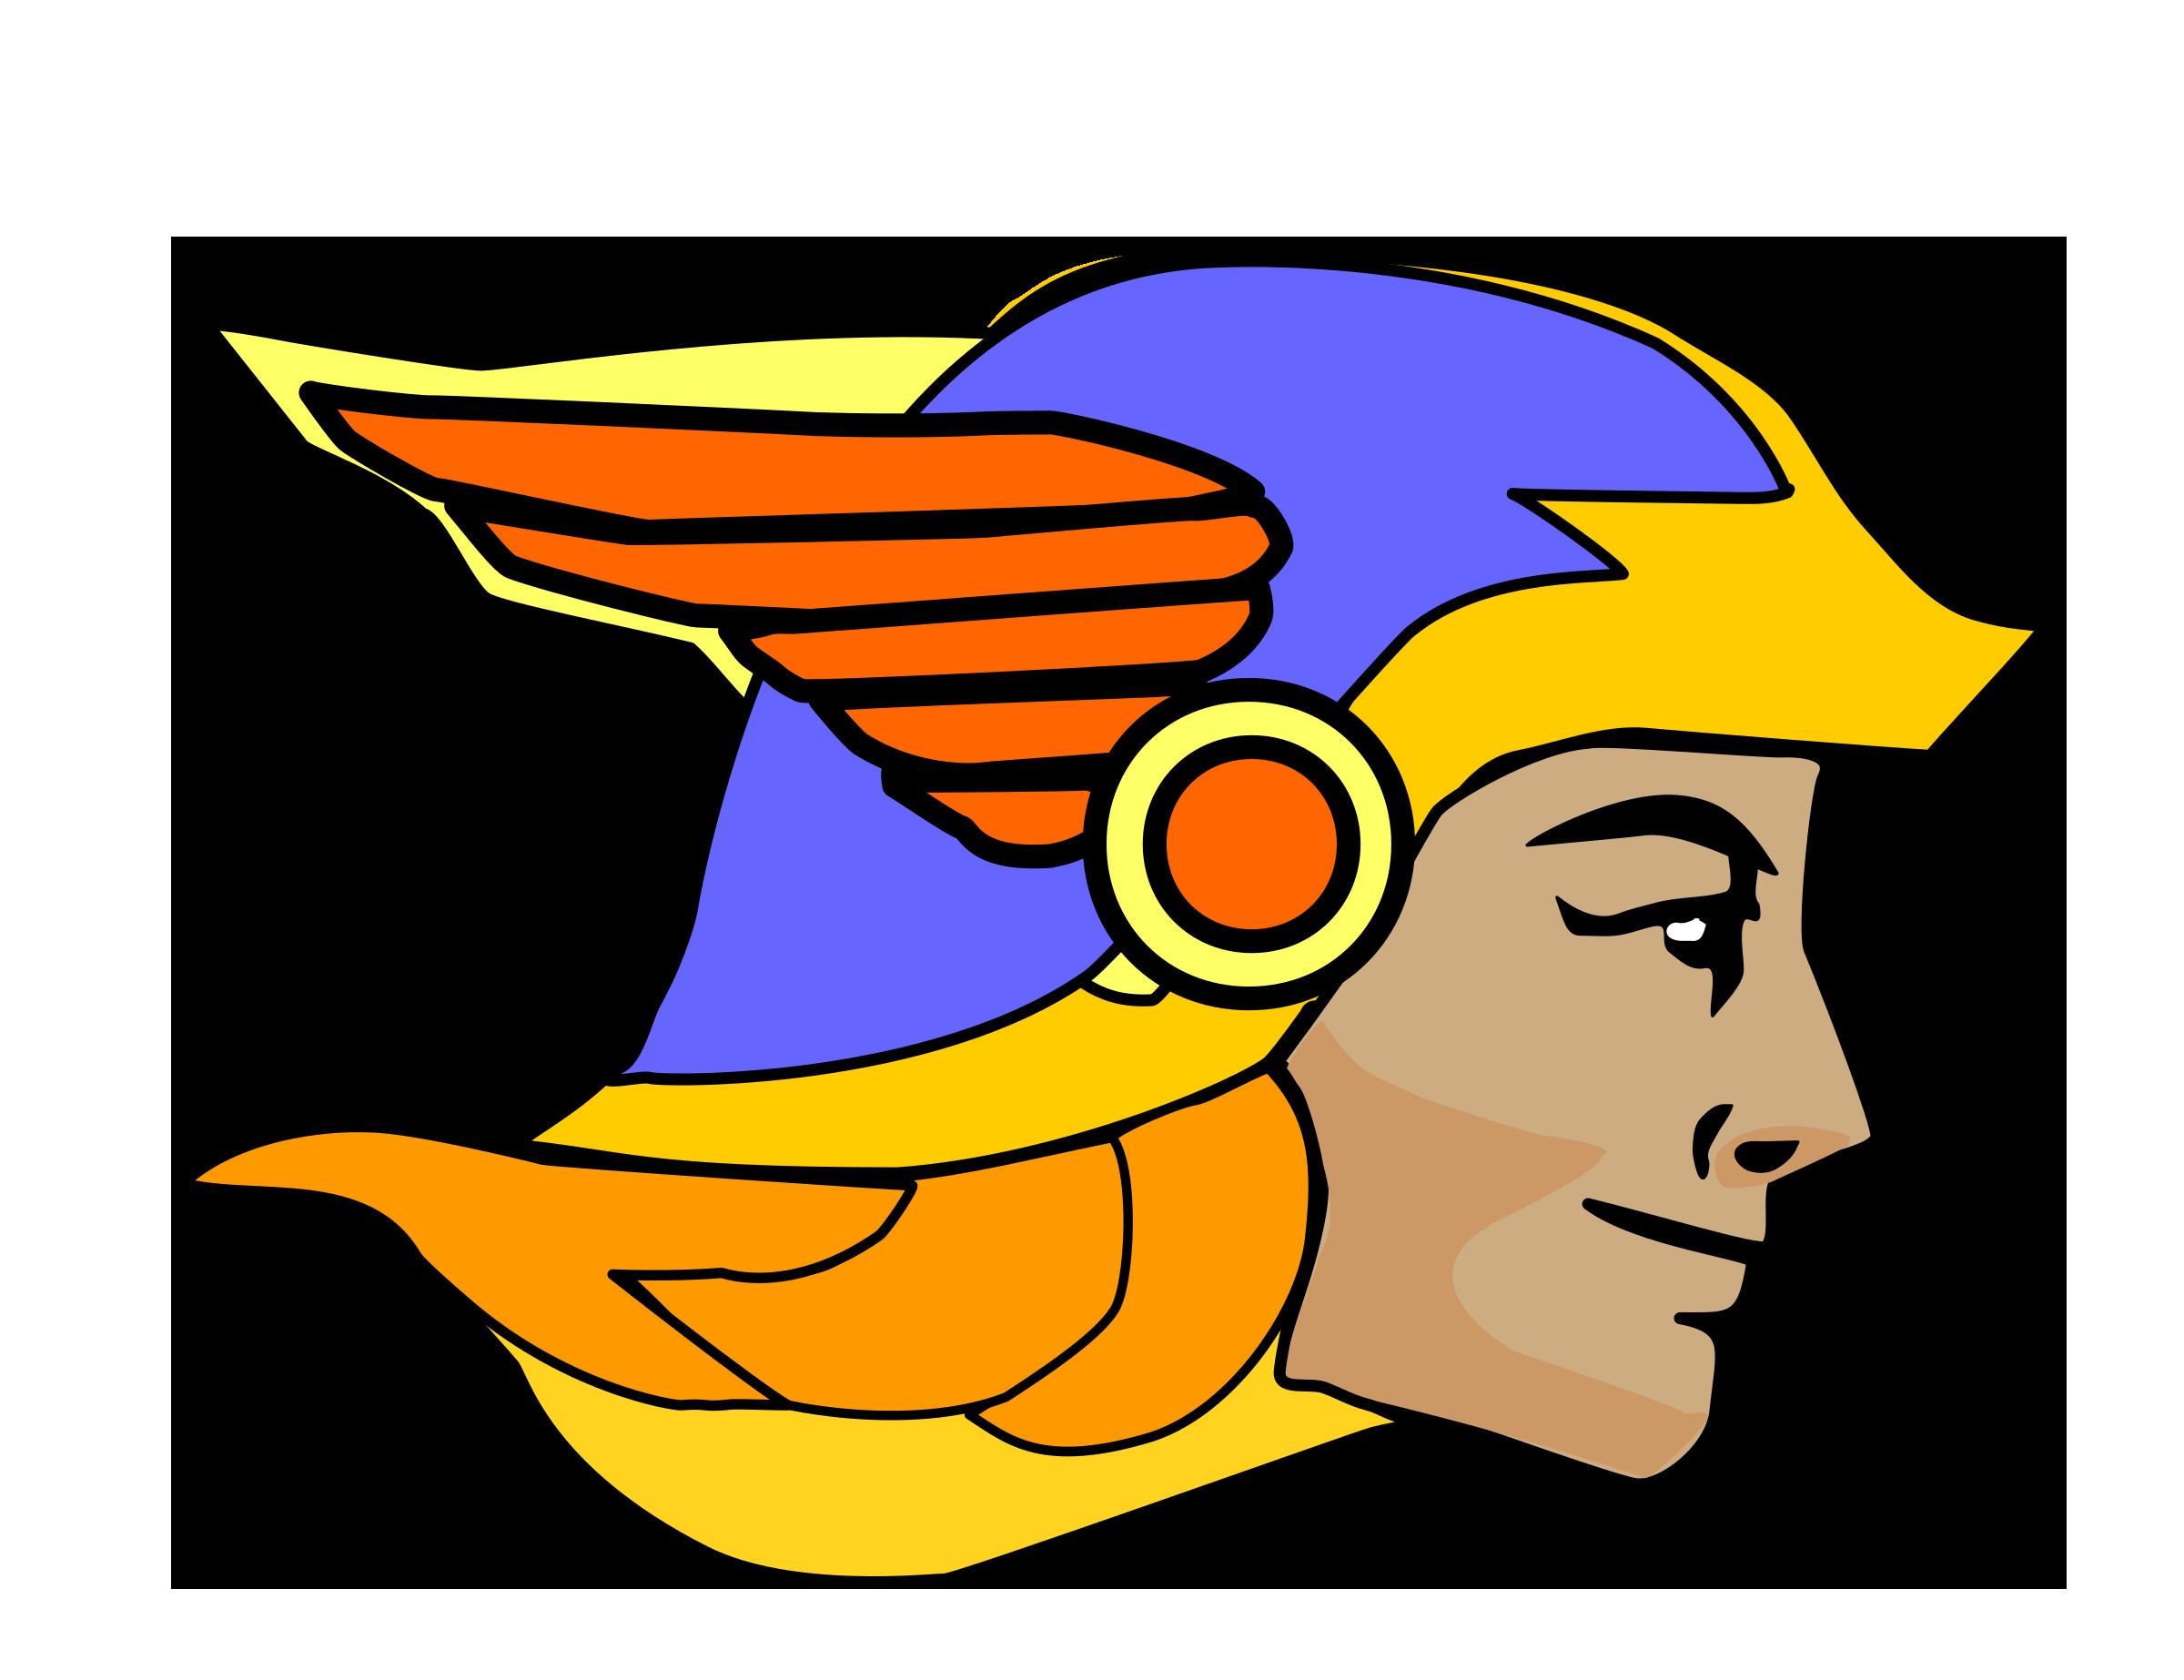 Hermes the messenger god vector clipart image free stock photo png  2400x1846 Hermes hat symbol 593b48ffdb1d